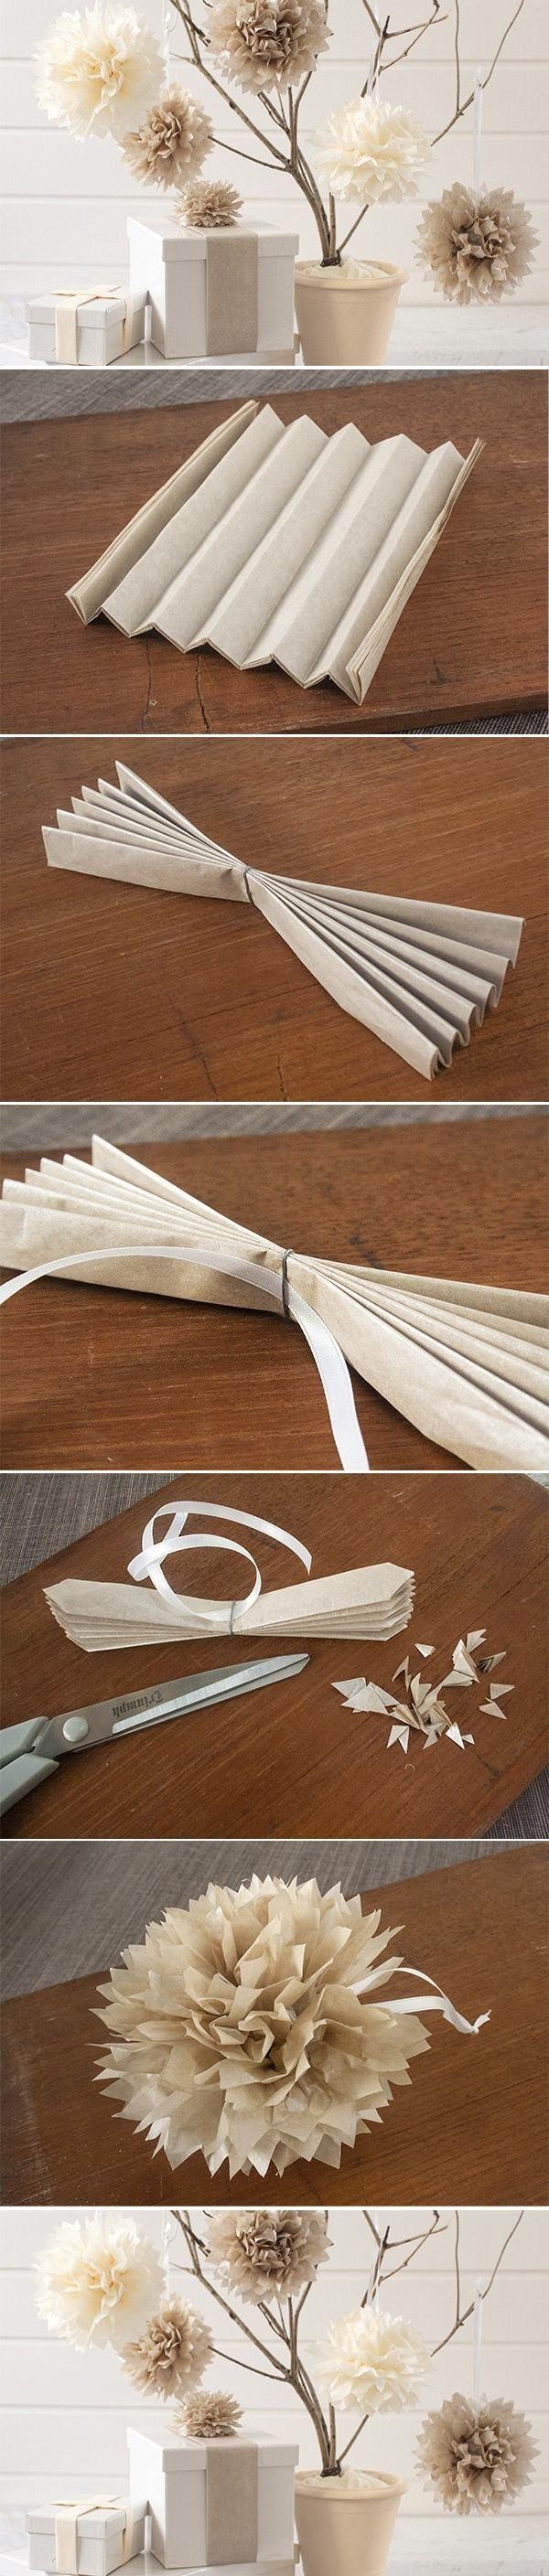 DIY Beautiful Paper Flower Ball